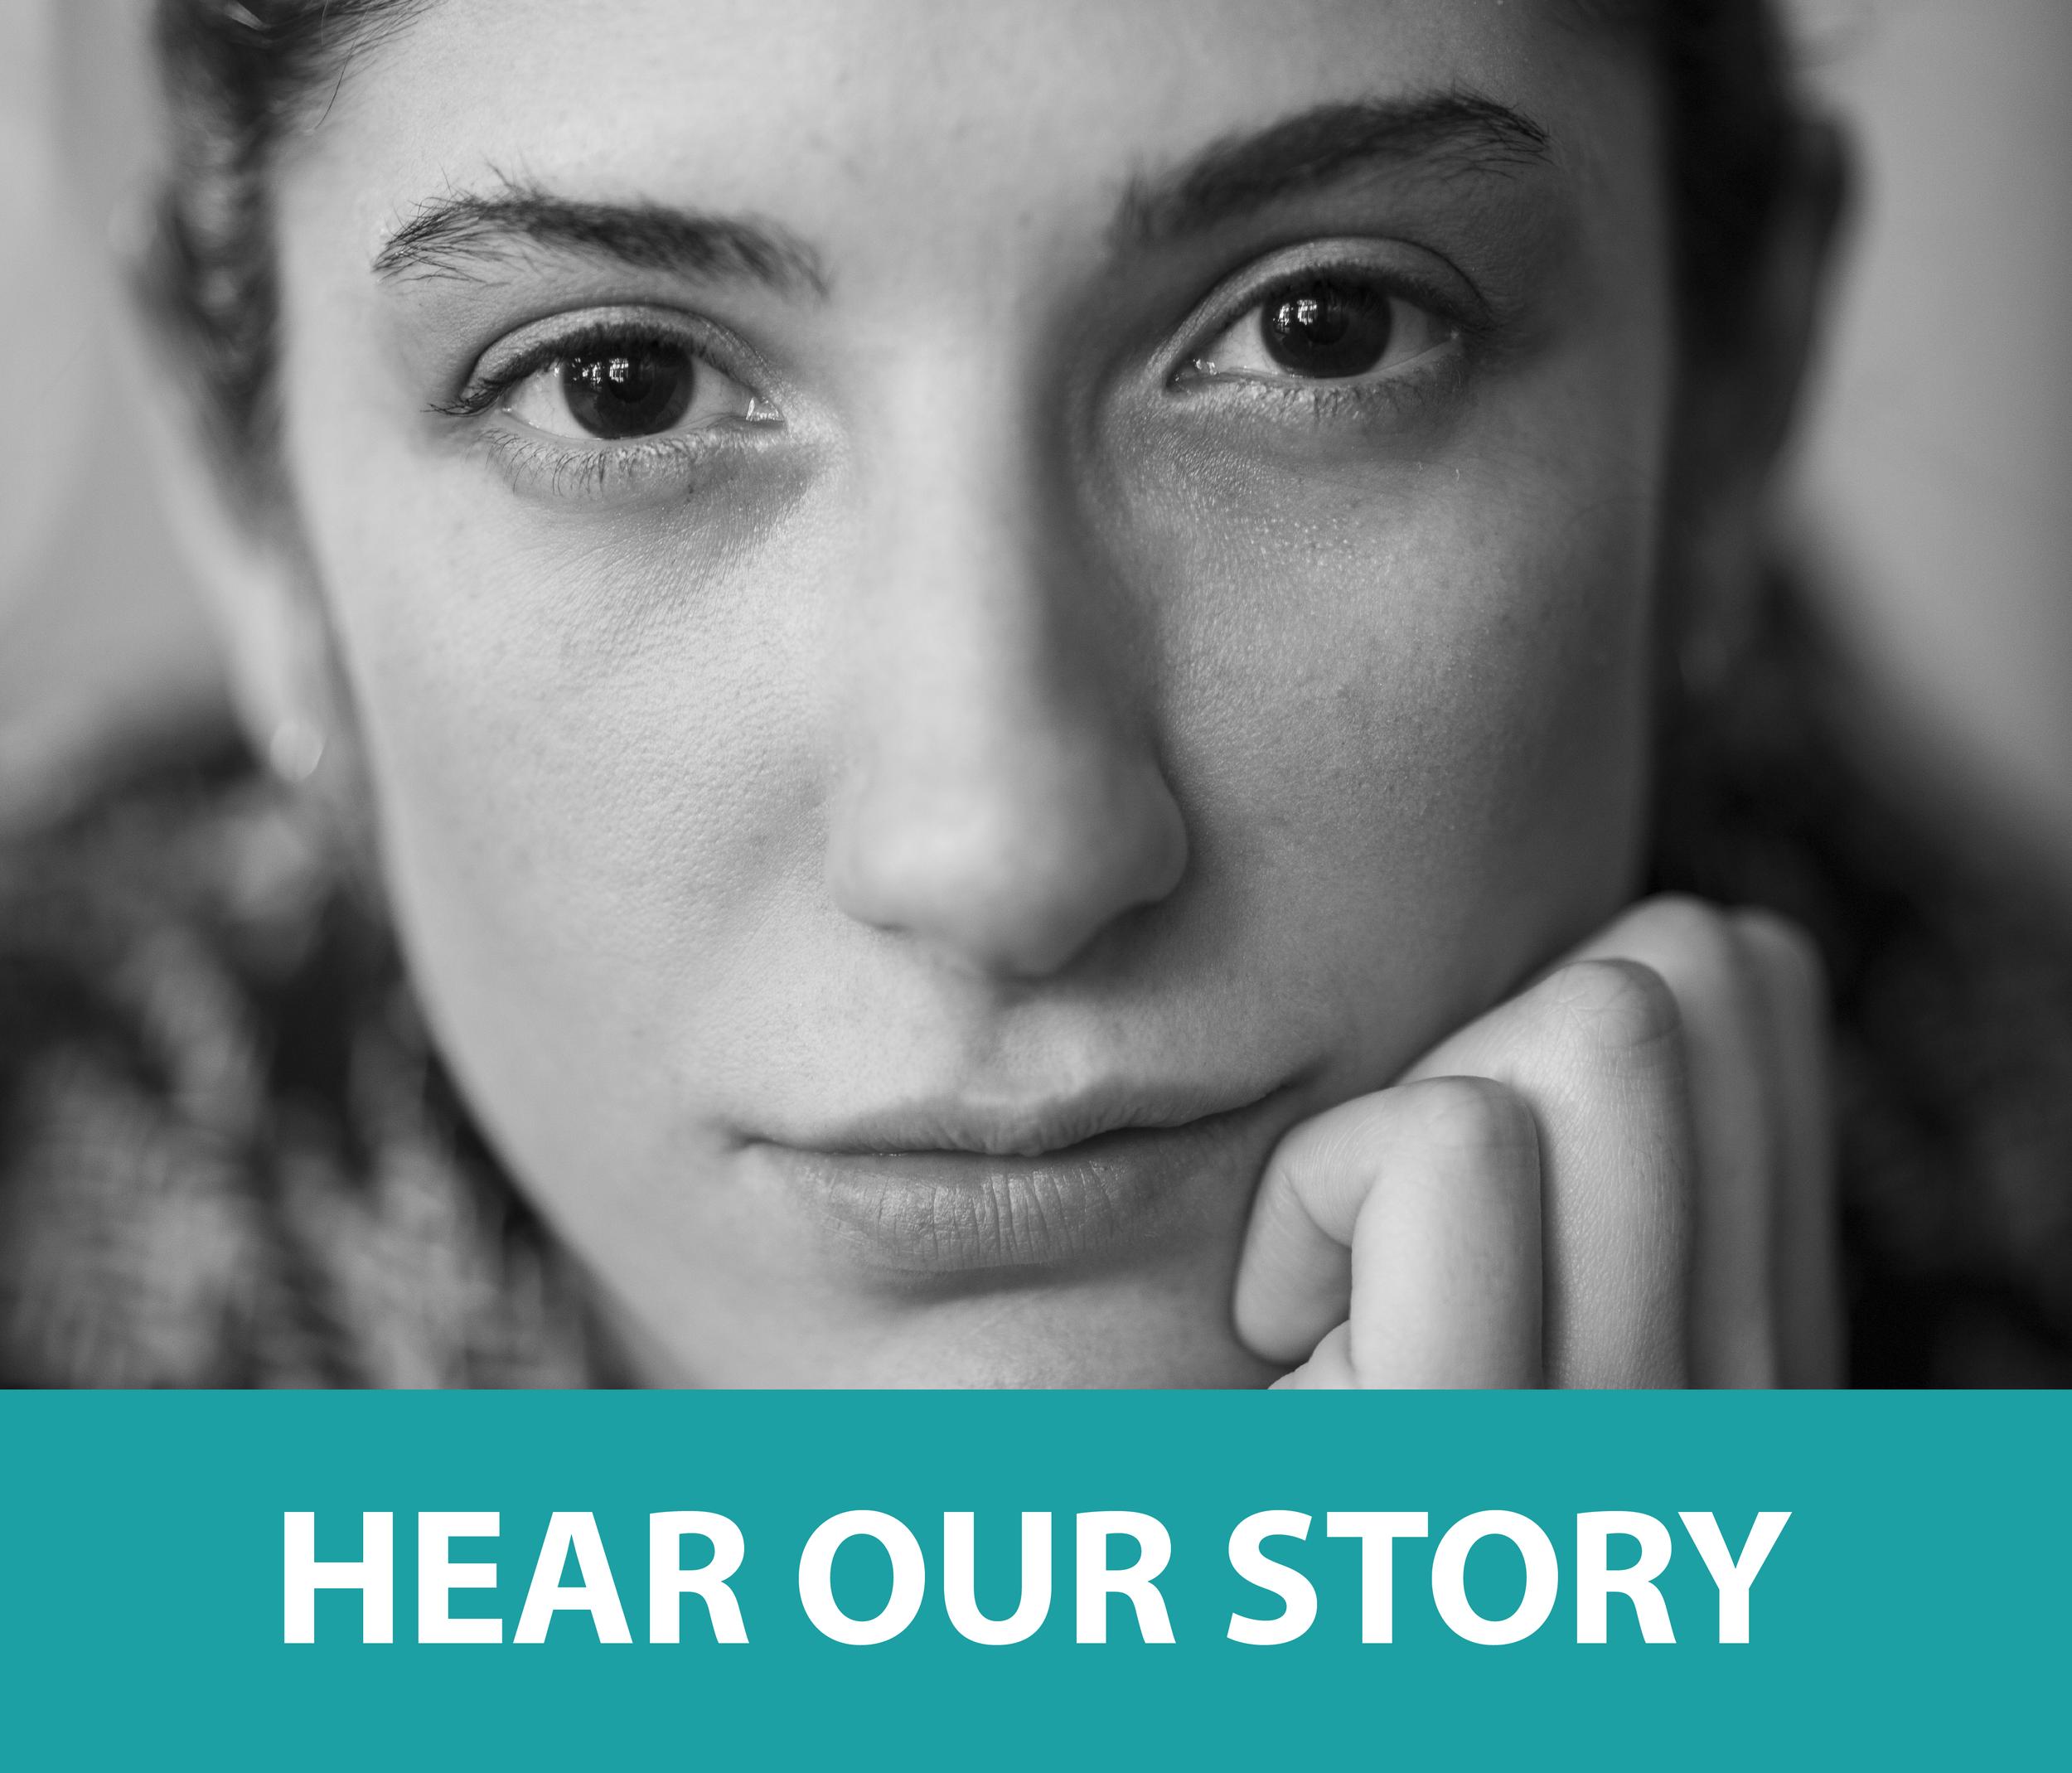 SENBAN_HEAR OUR STORY .png